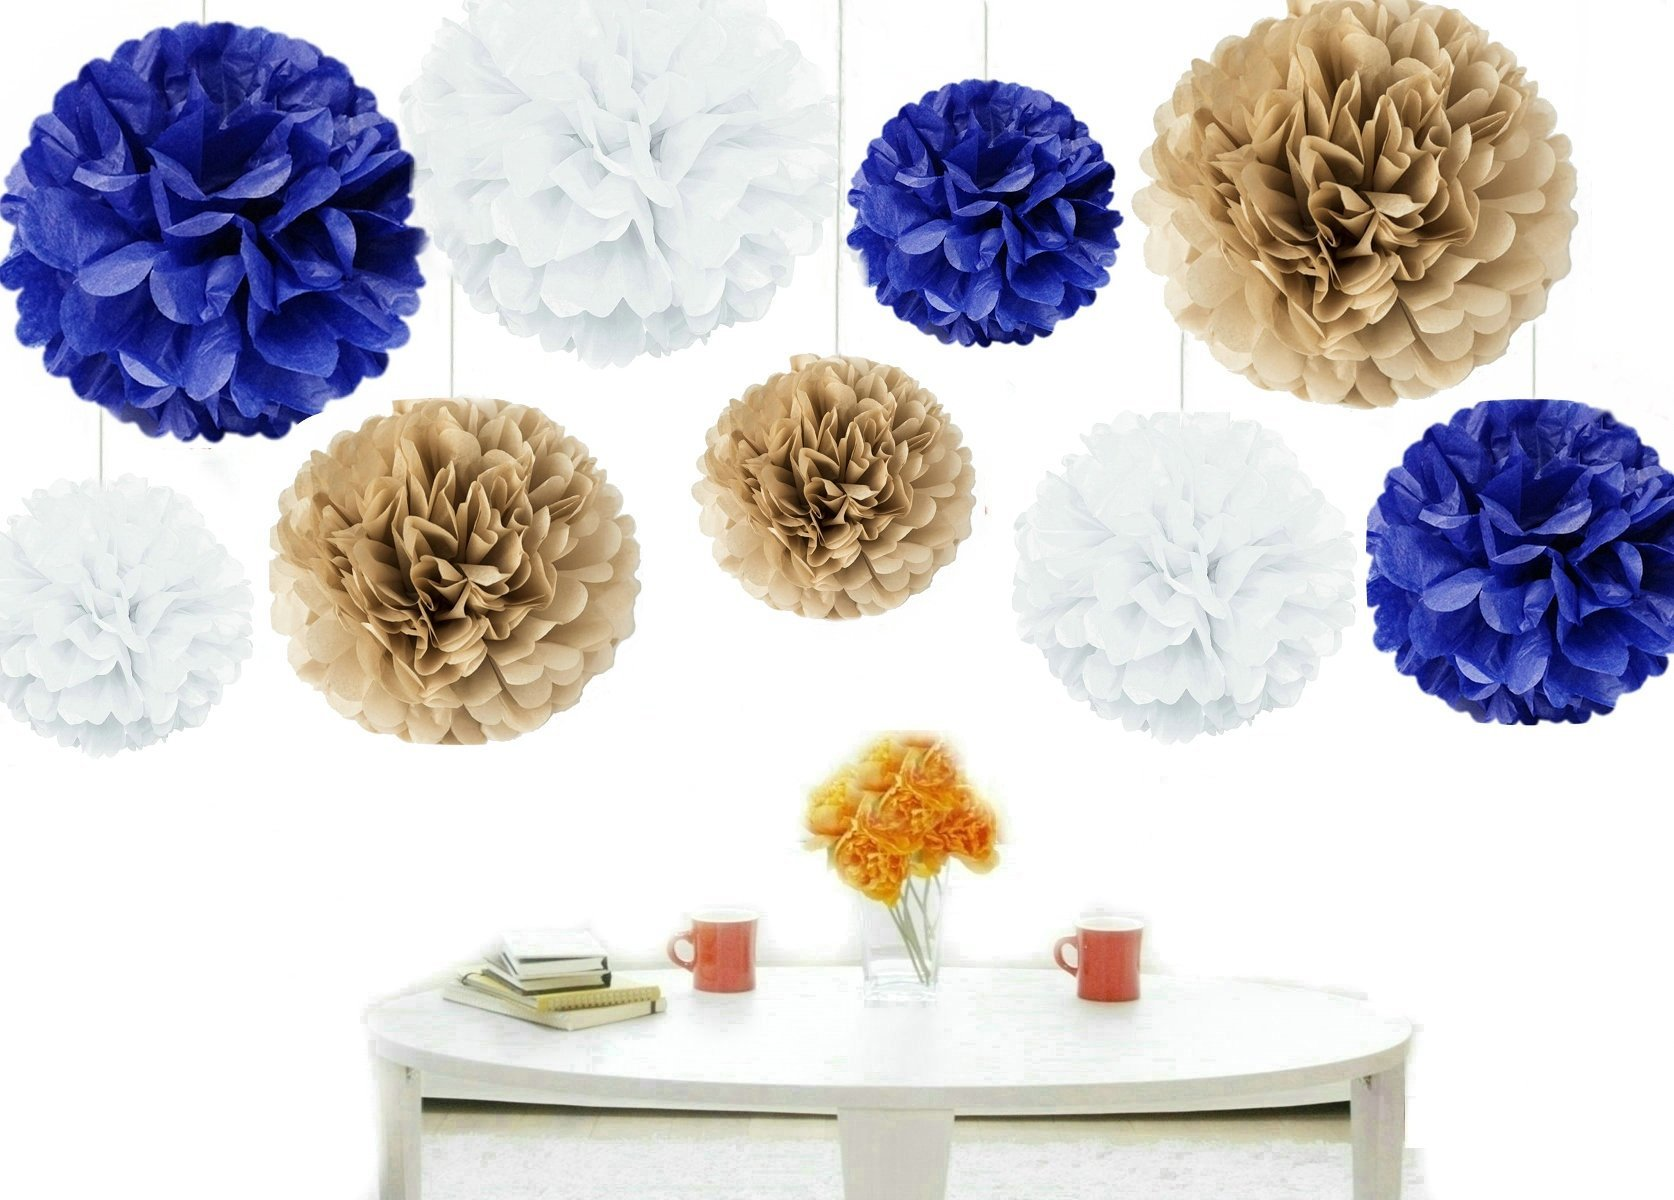 Kubert® 18pcs Mixed Sizes 8'' 10'' 14'' Premium Tissue Paper Pom-poms Flower Ball Wedding Party Outdoor Decoration - Royal Blue, Gold & White